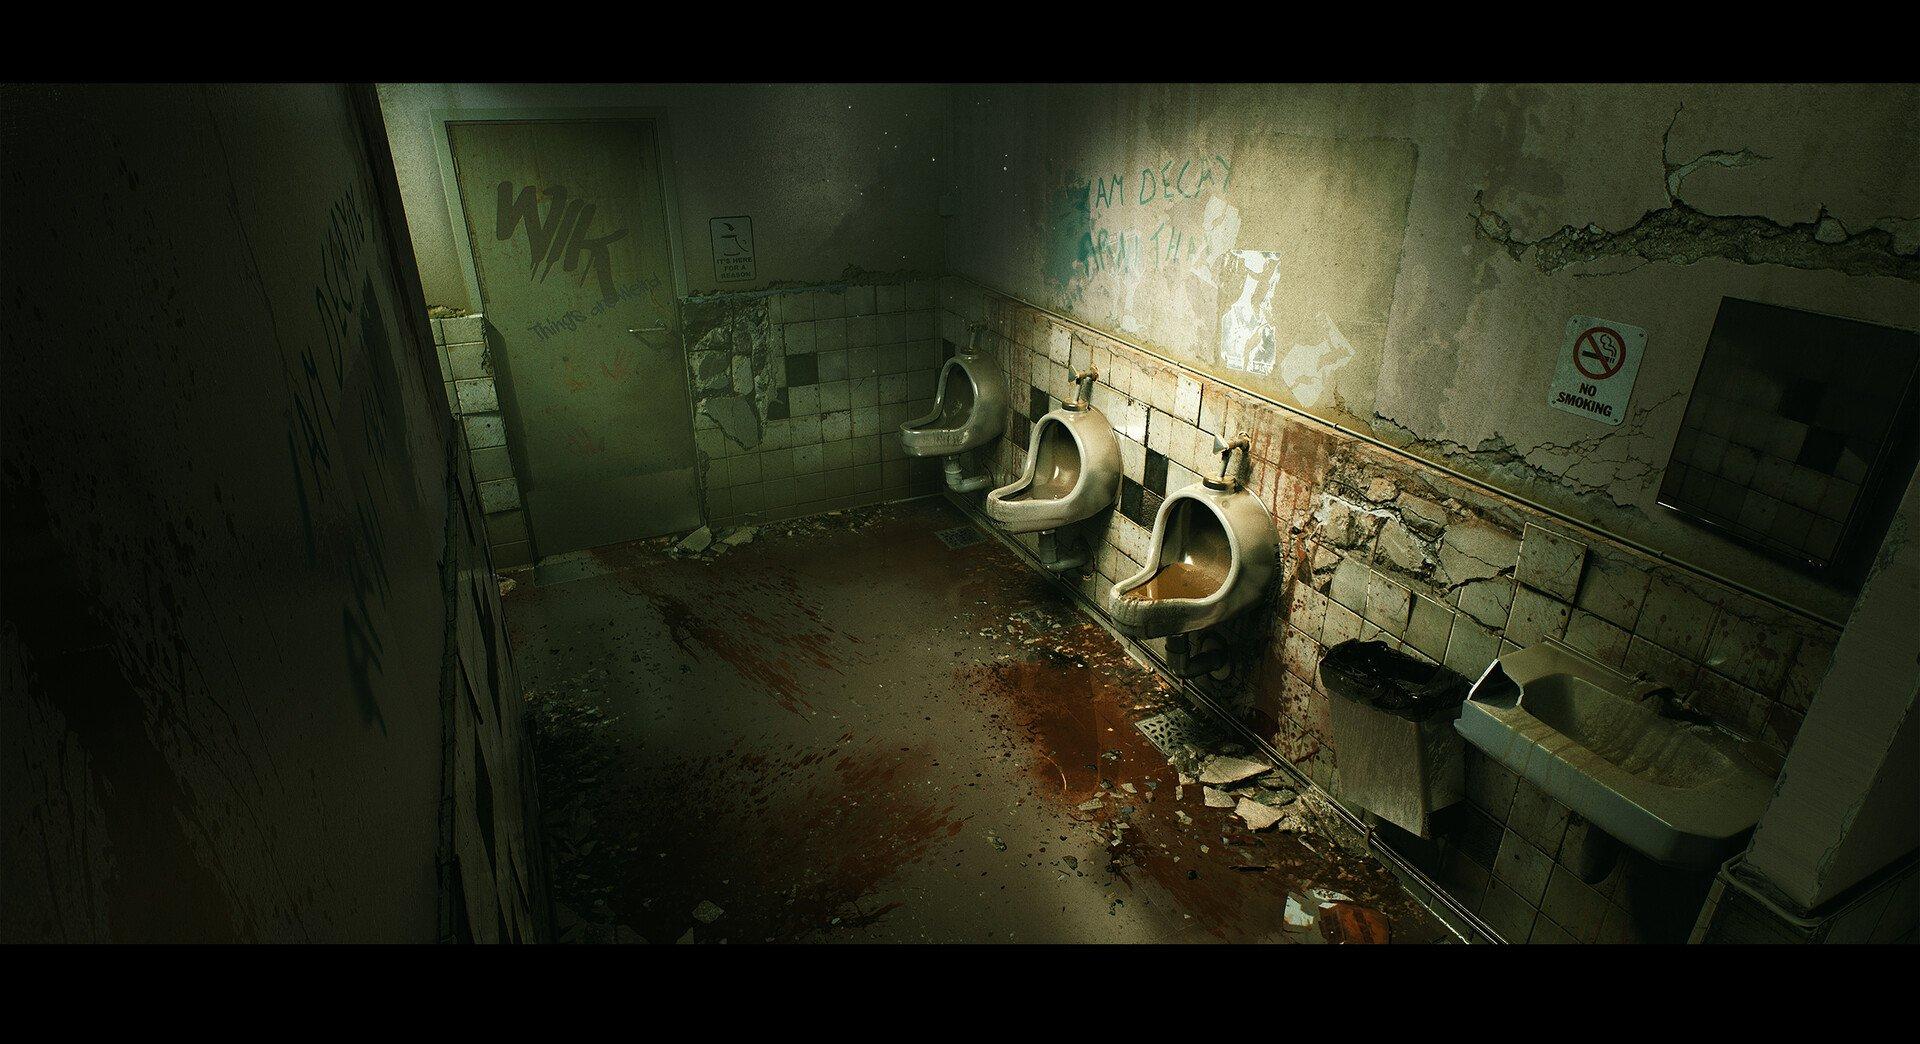 Quixel S 3d Art Lead Remakes Silent Hill 2 Bathroom Scene In